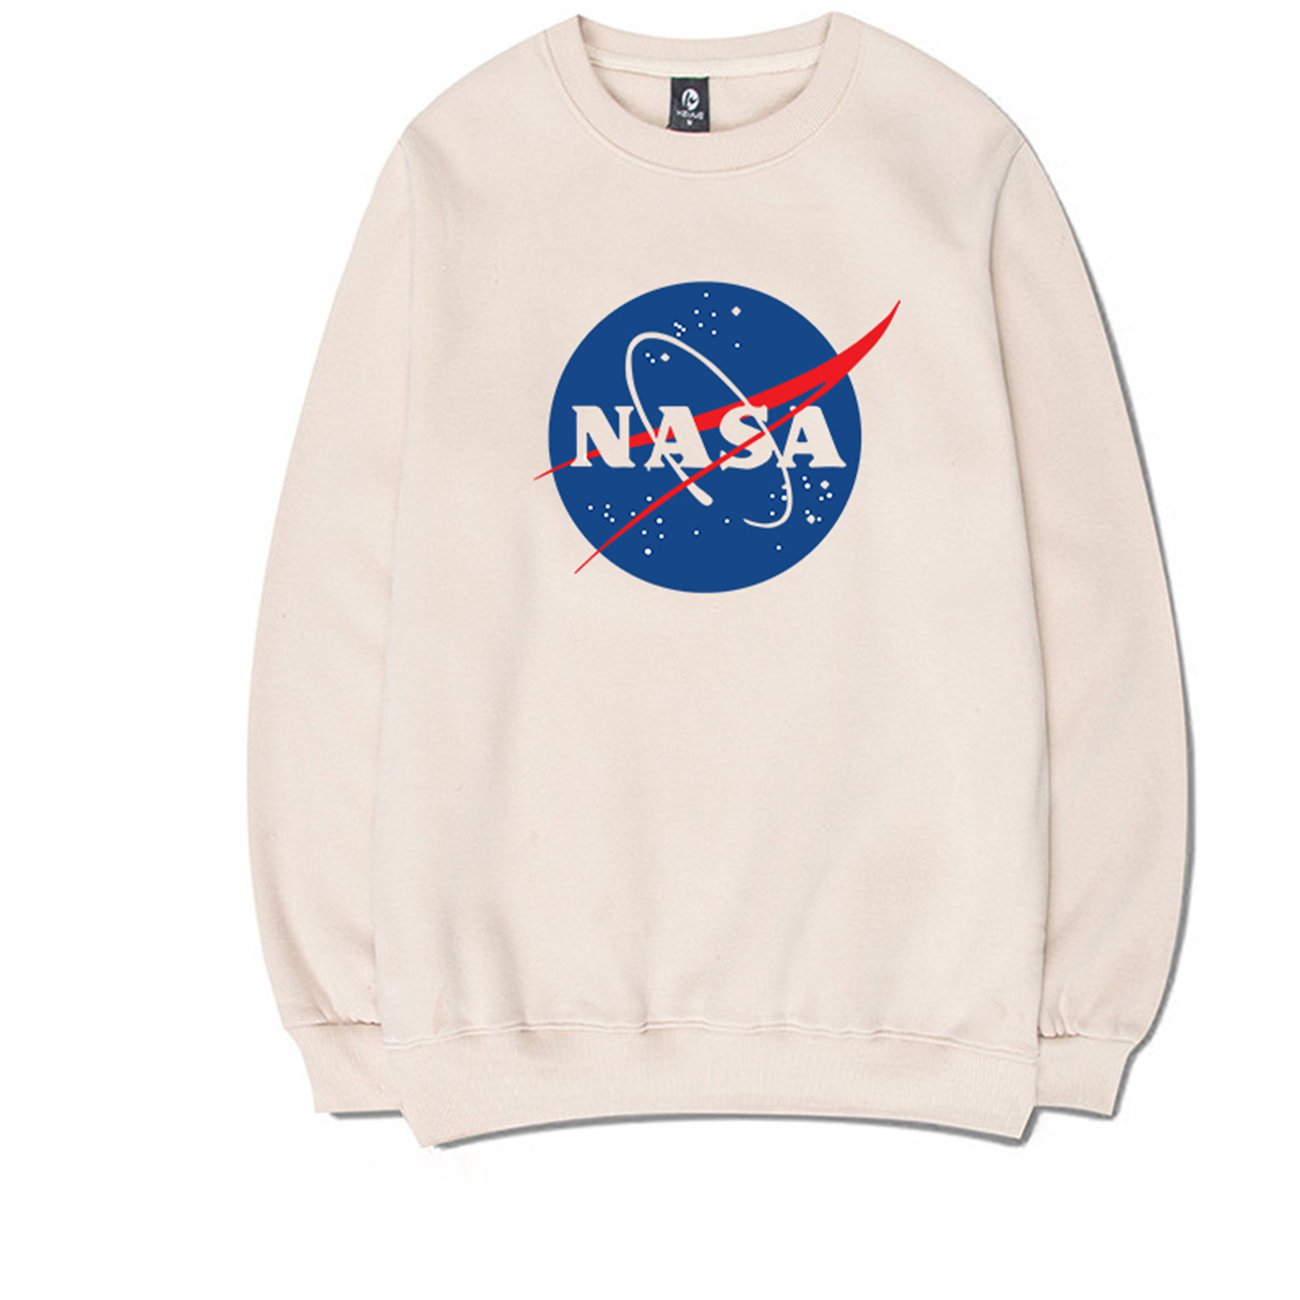 CORIRESHA Street Fashion Big Front NASA Logo Print Round Neck Long Sleeve Pull Over Sweatshirt